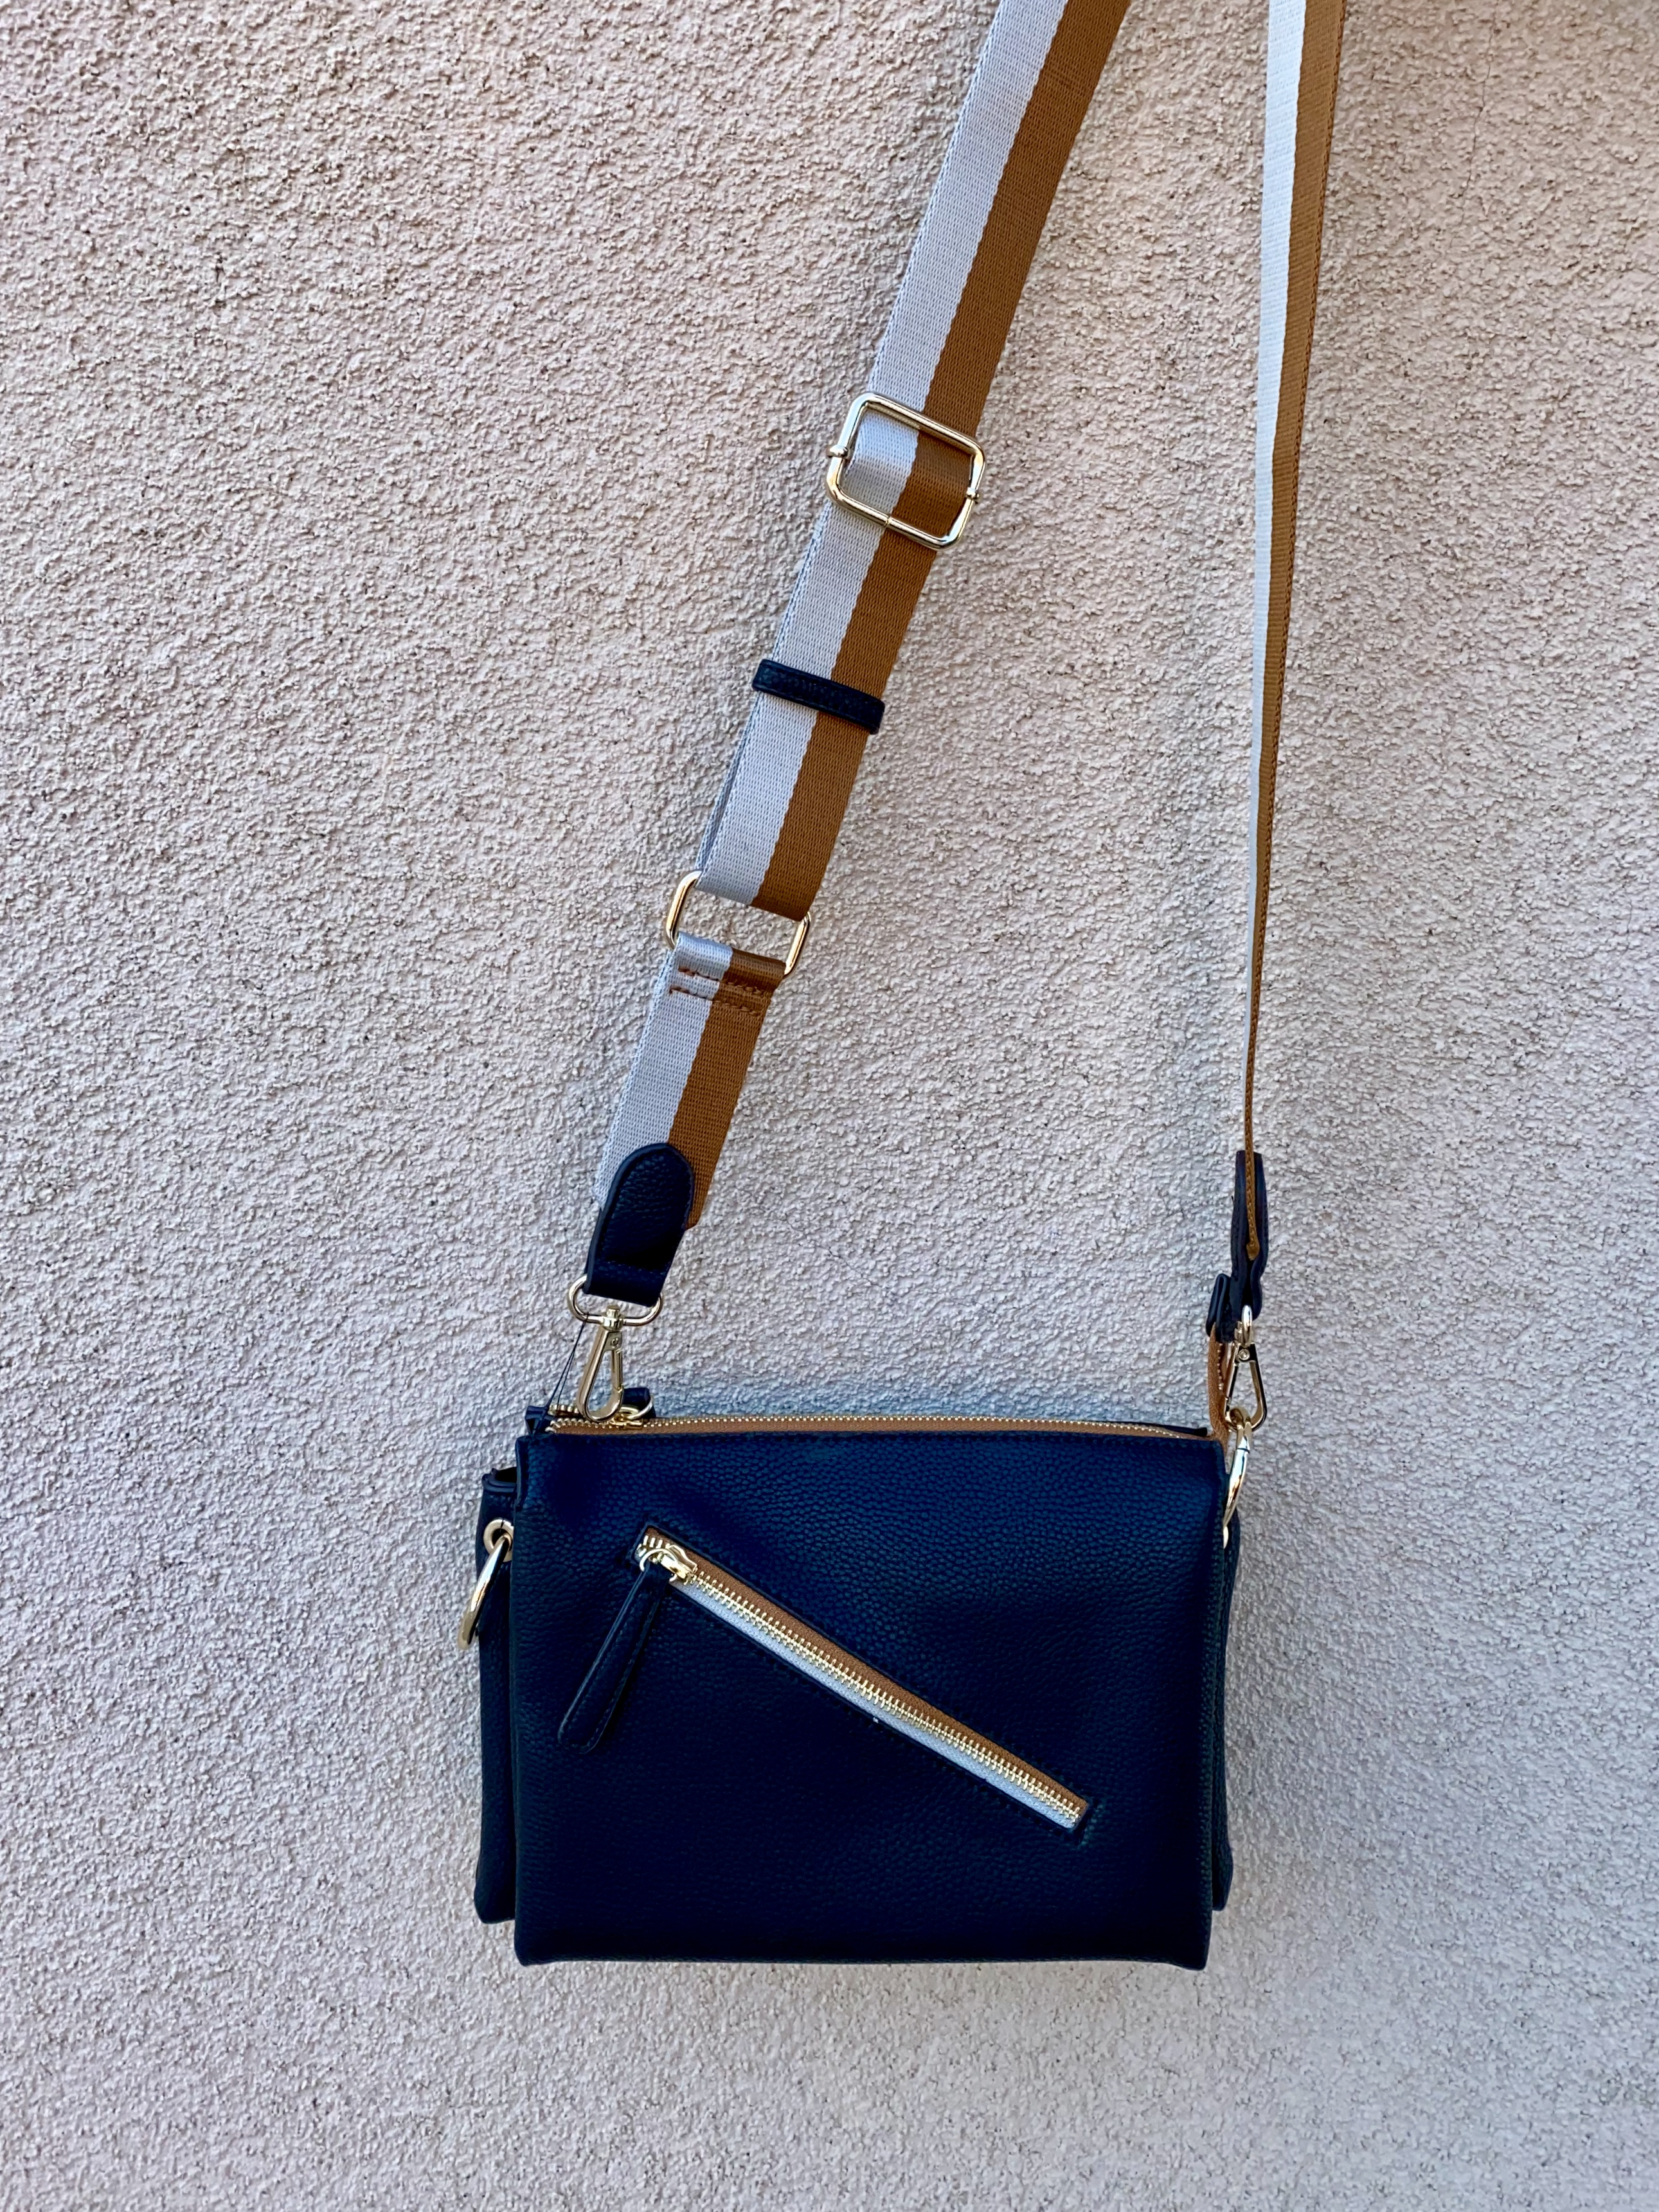 SRSR purse $69